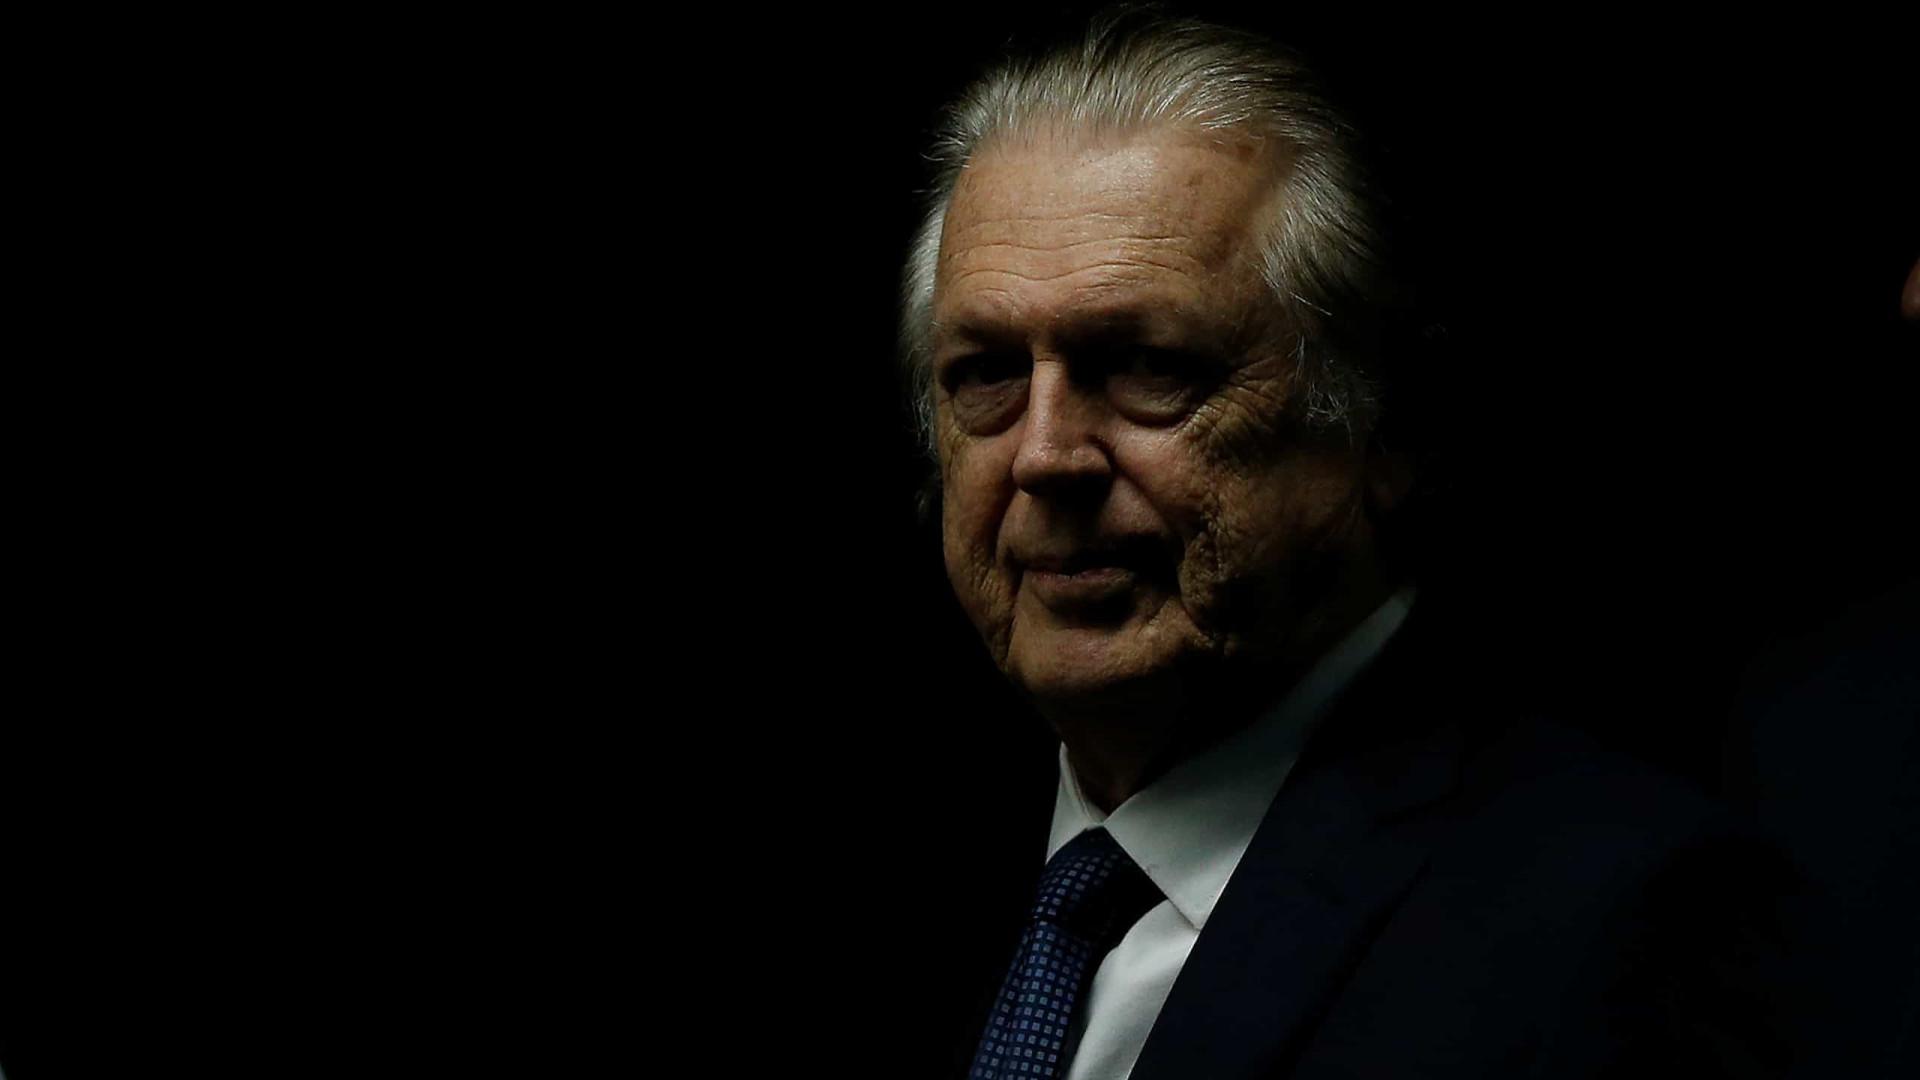 PSL paga aluguel a empresa de Bivar, presidente da sigla